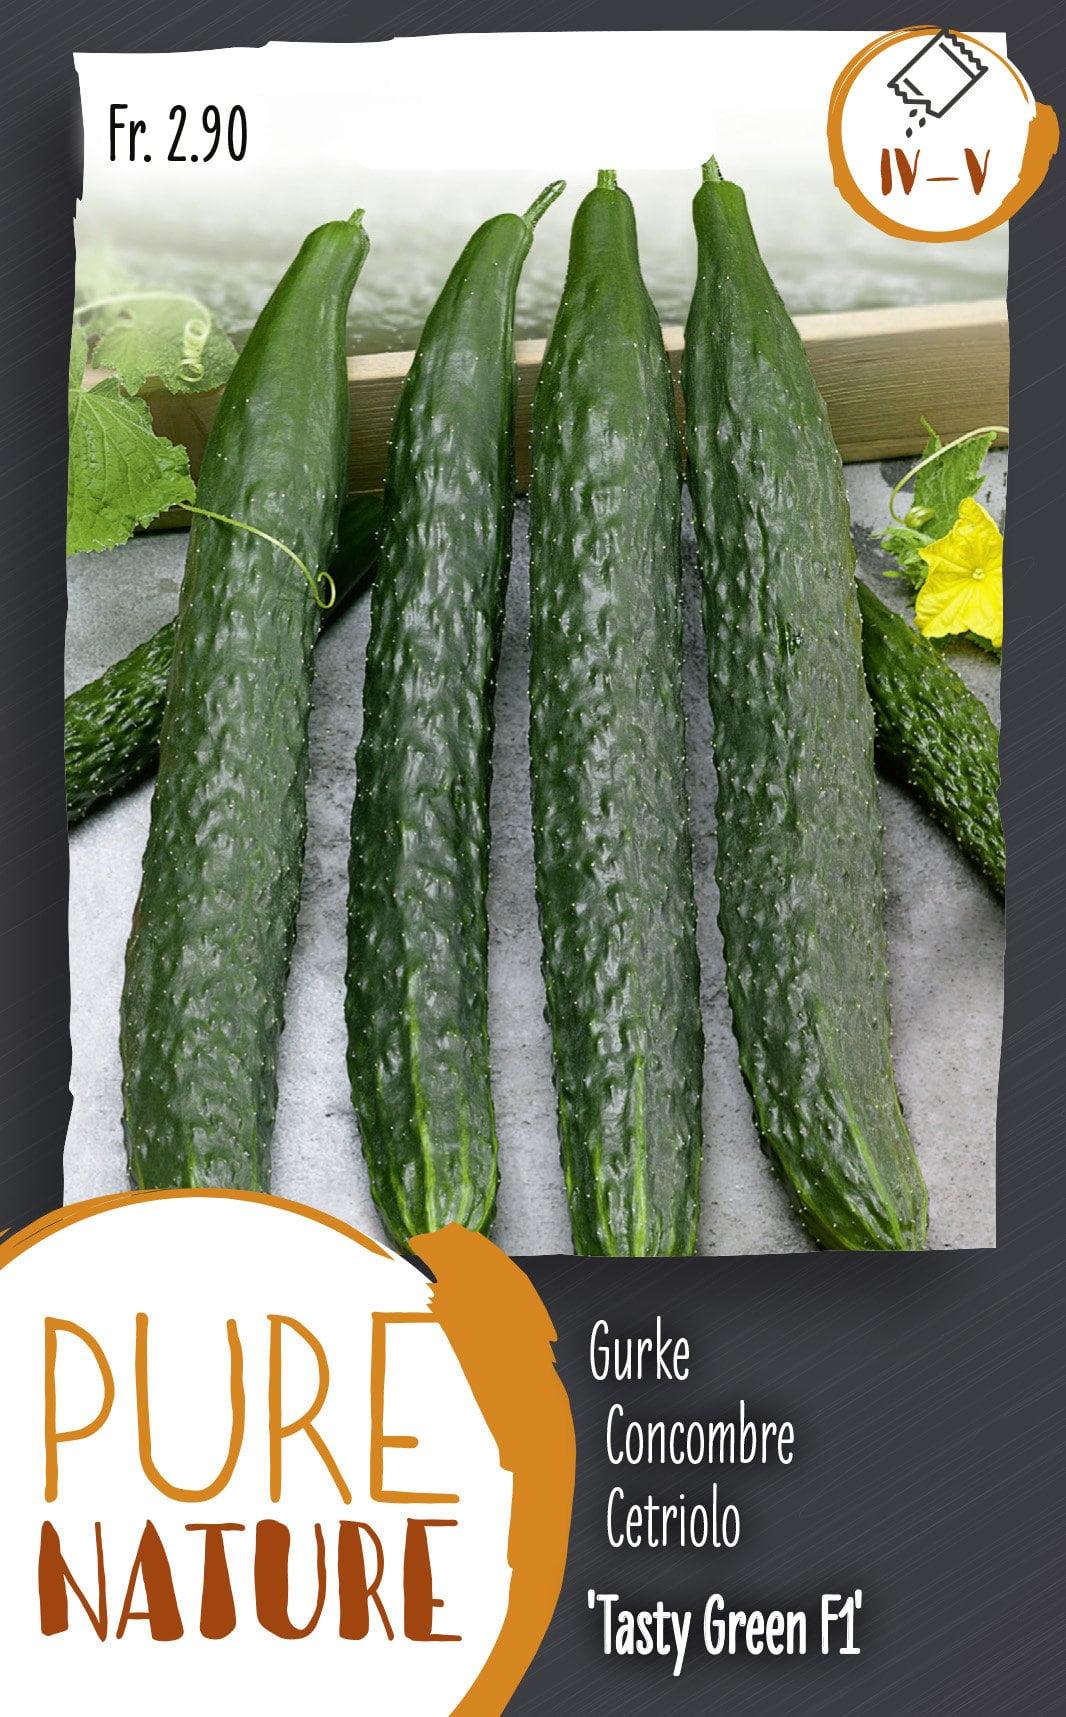 Do it + Garden Concombre 'Tasty Green' F1 0.5g Semences de legumes